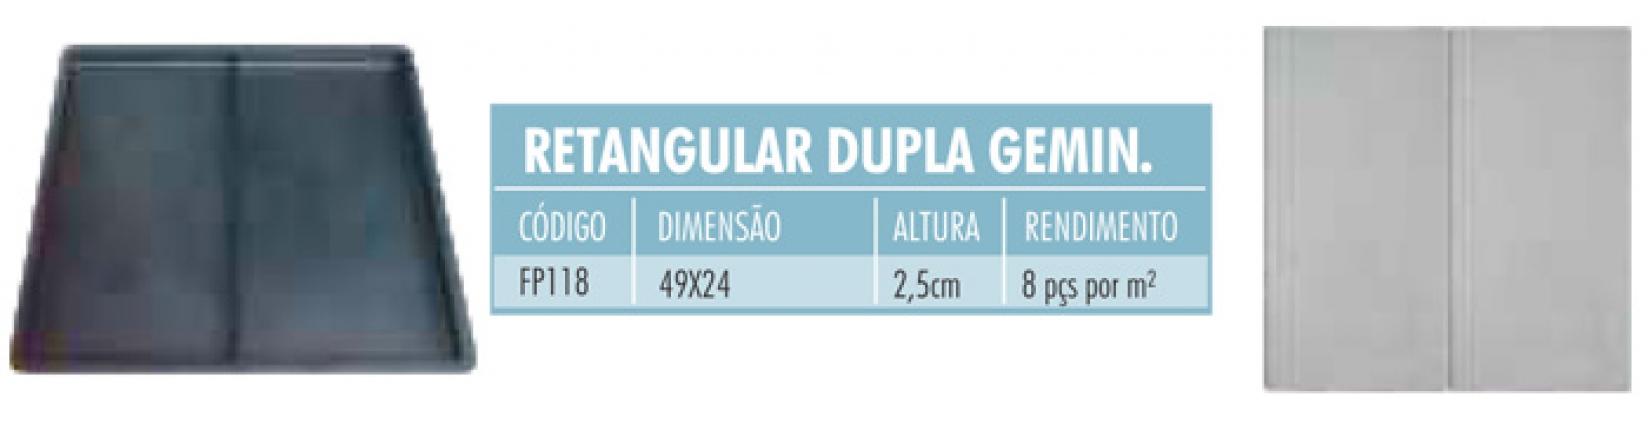 FormasPlasticas-20150313120734.jpg